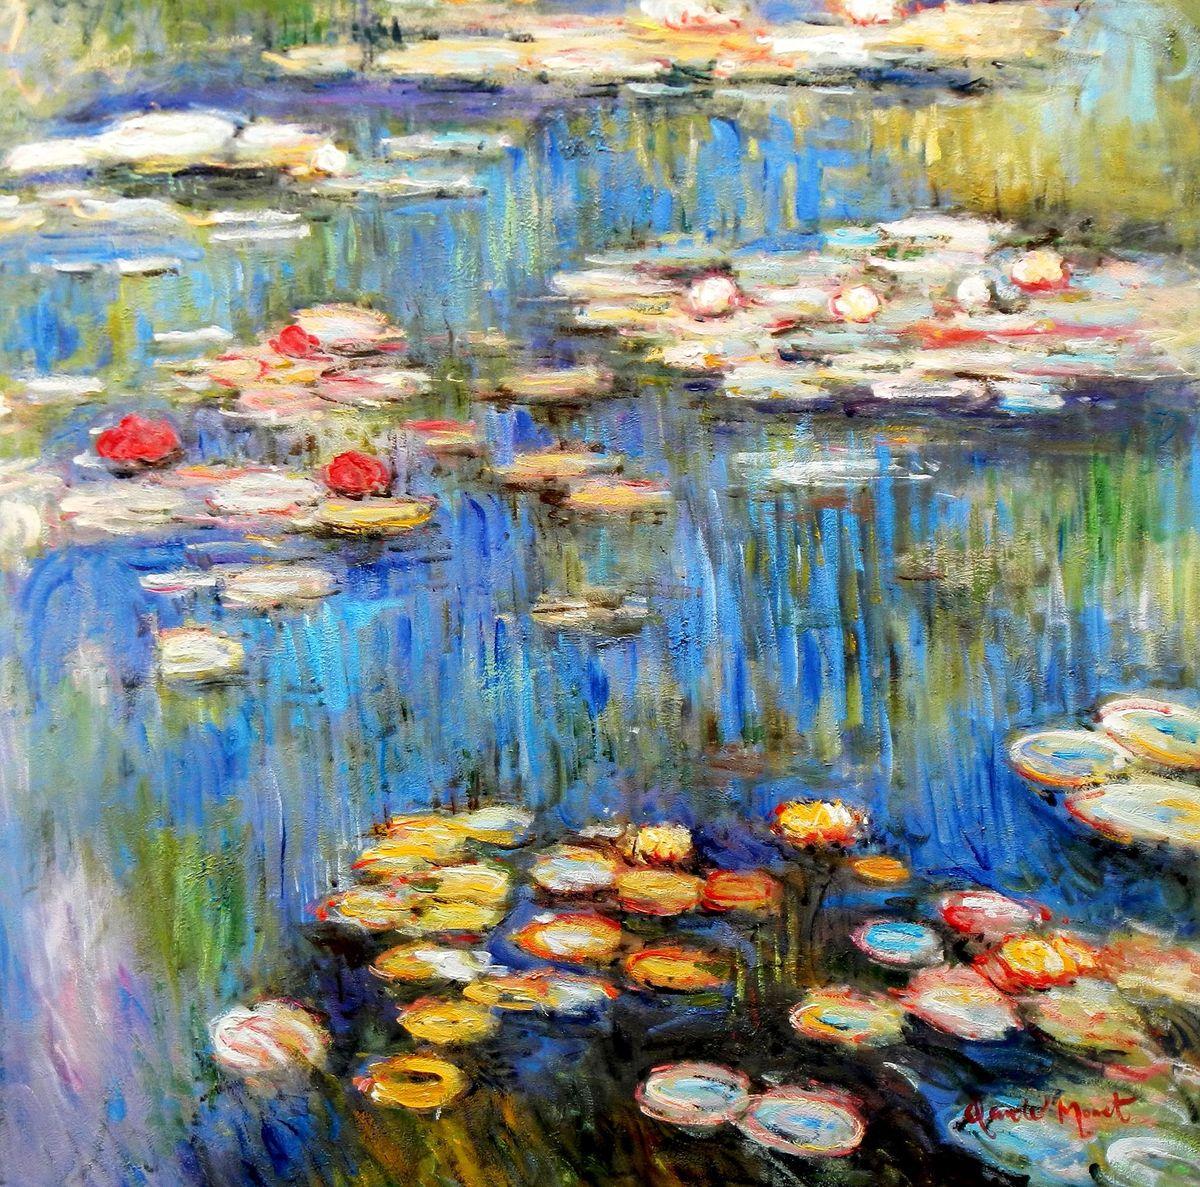 Claude Monet - Seerosen im Frühling g96830 80x80cm Ölgemälde handgemalt